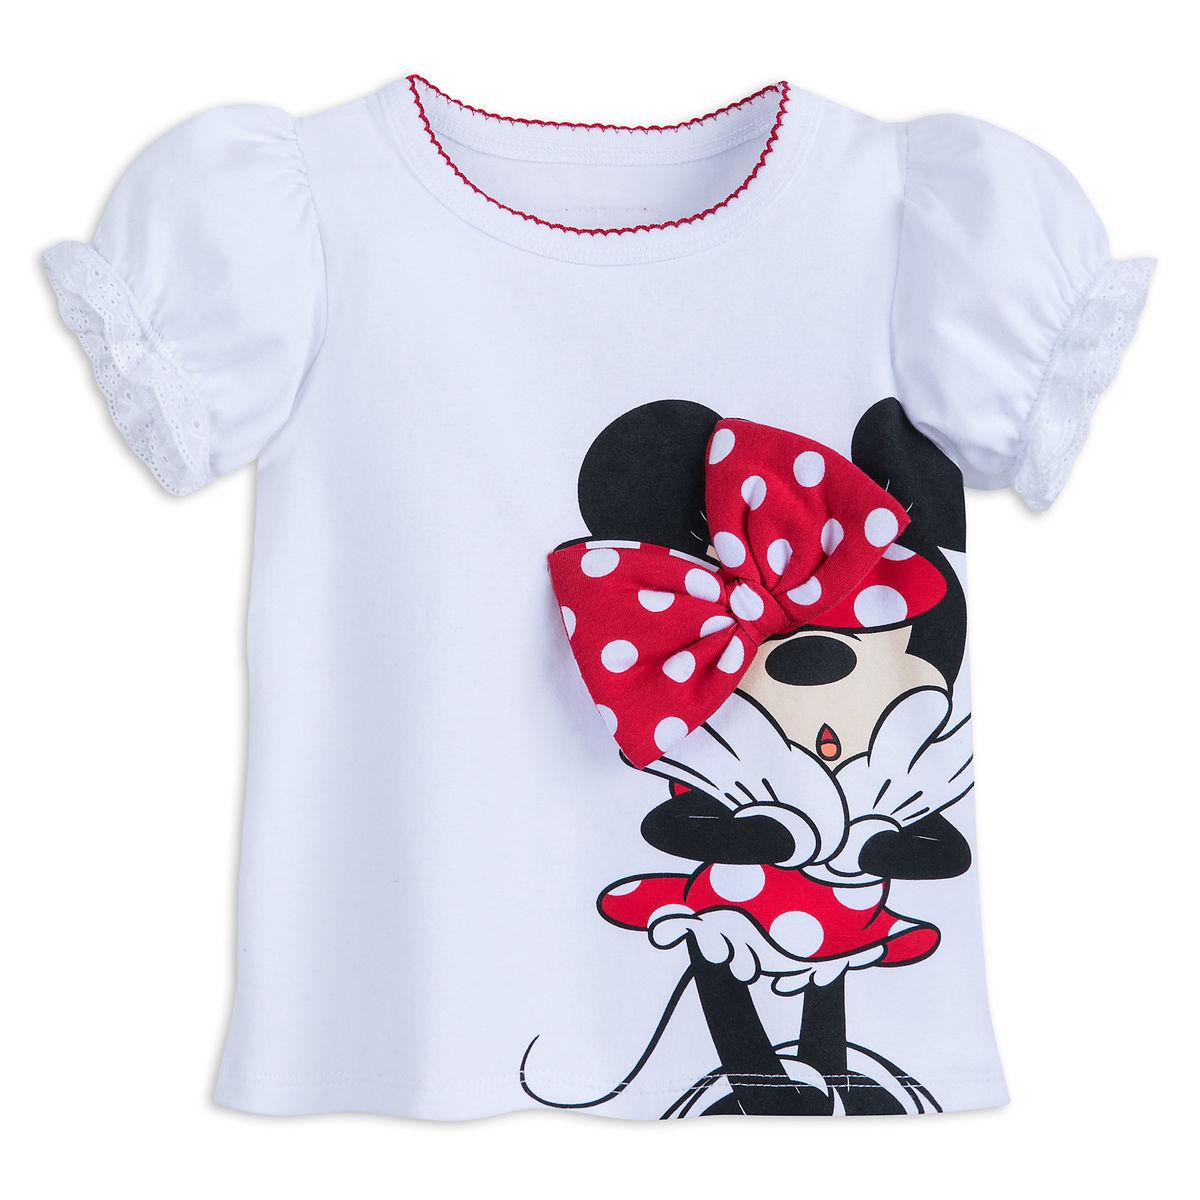 3df2b4f1b Disney Baby Shirt - Minnie Mouse Bow T-Shirt for Girls